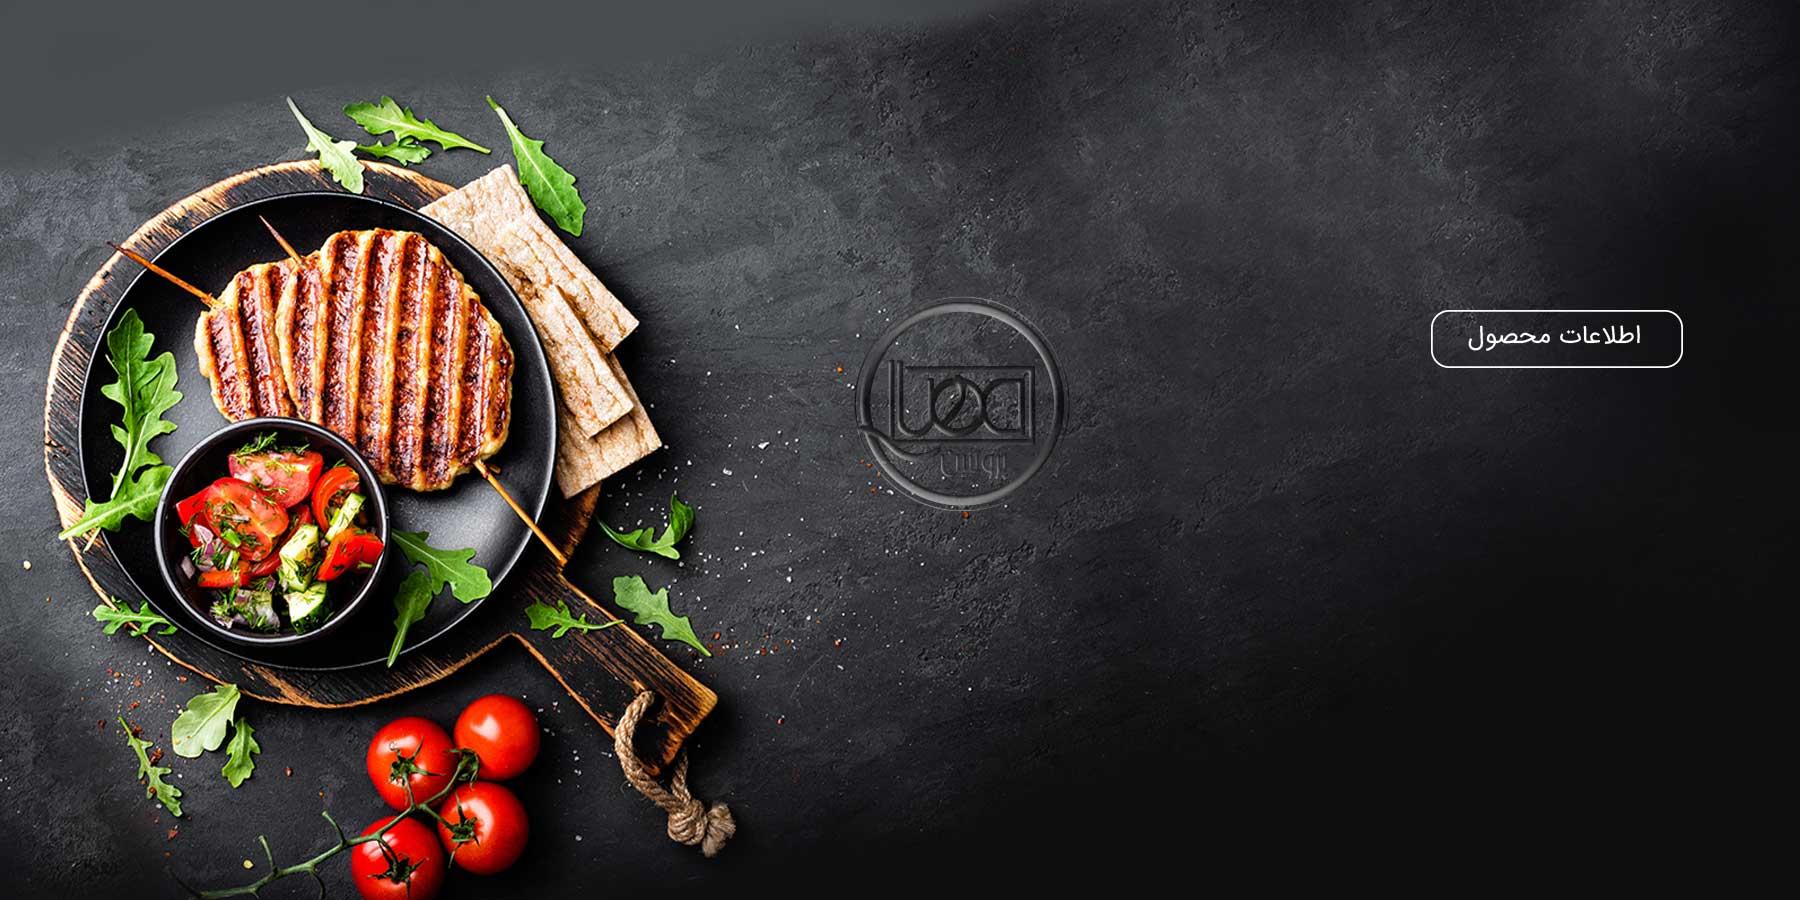 گوشت مرغ مهیا پروتئین